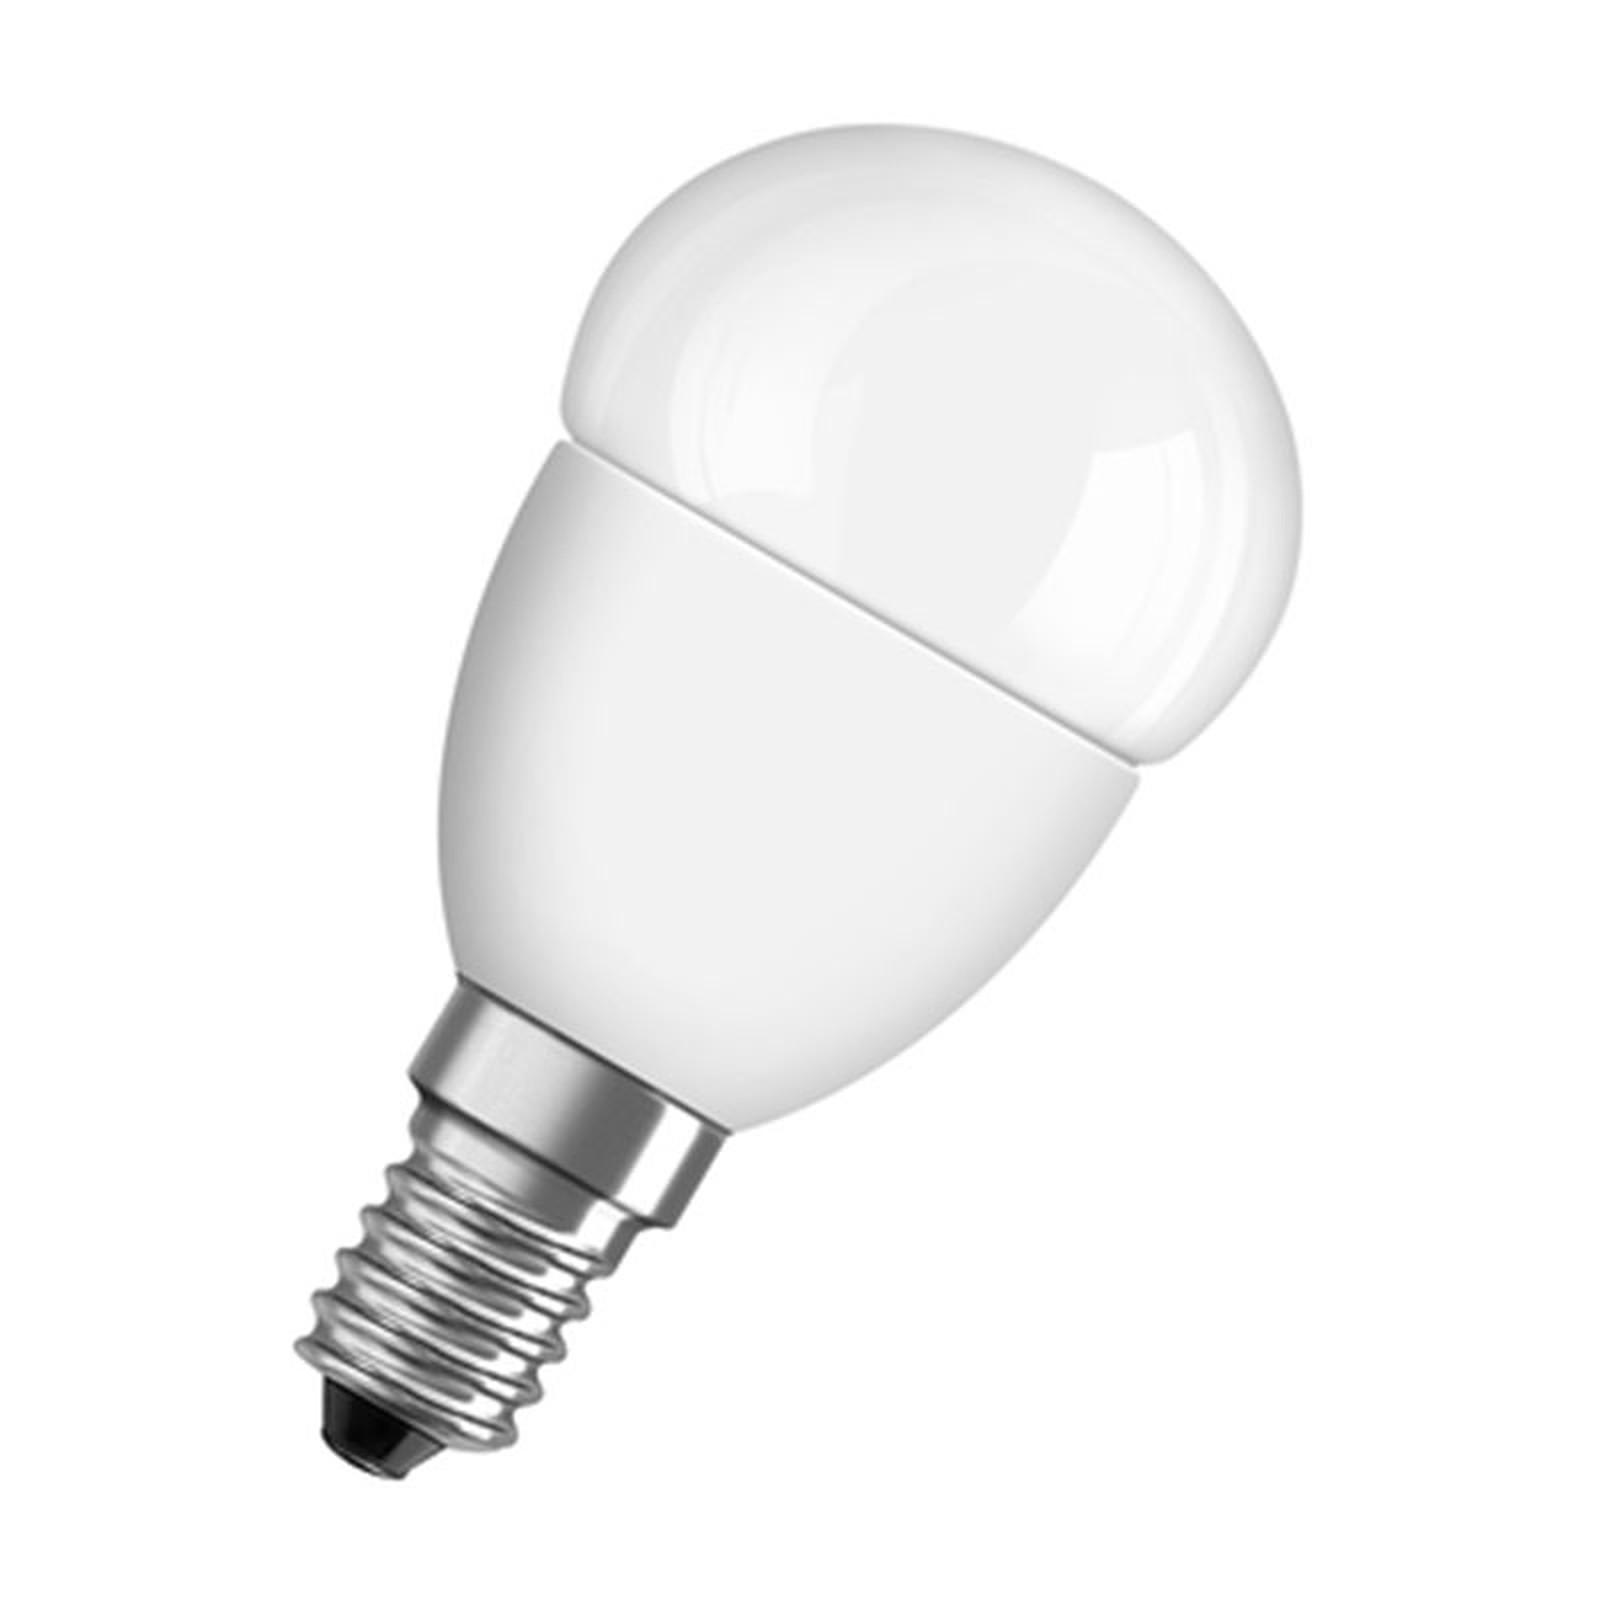 Osram Ampoule Led Retrofit Standard E27 4w 40w A: OSRAM Ampoule LED Superstar Sphérique E14 6W (40W) A